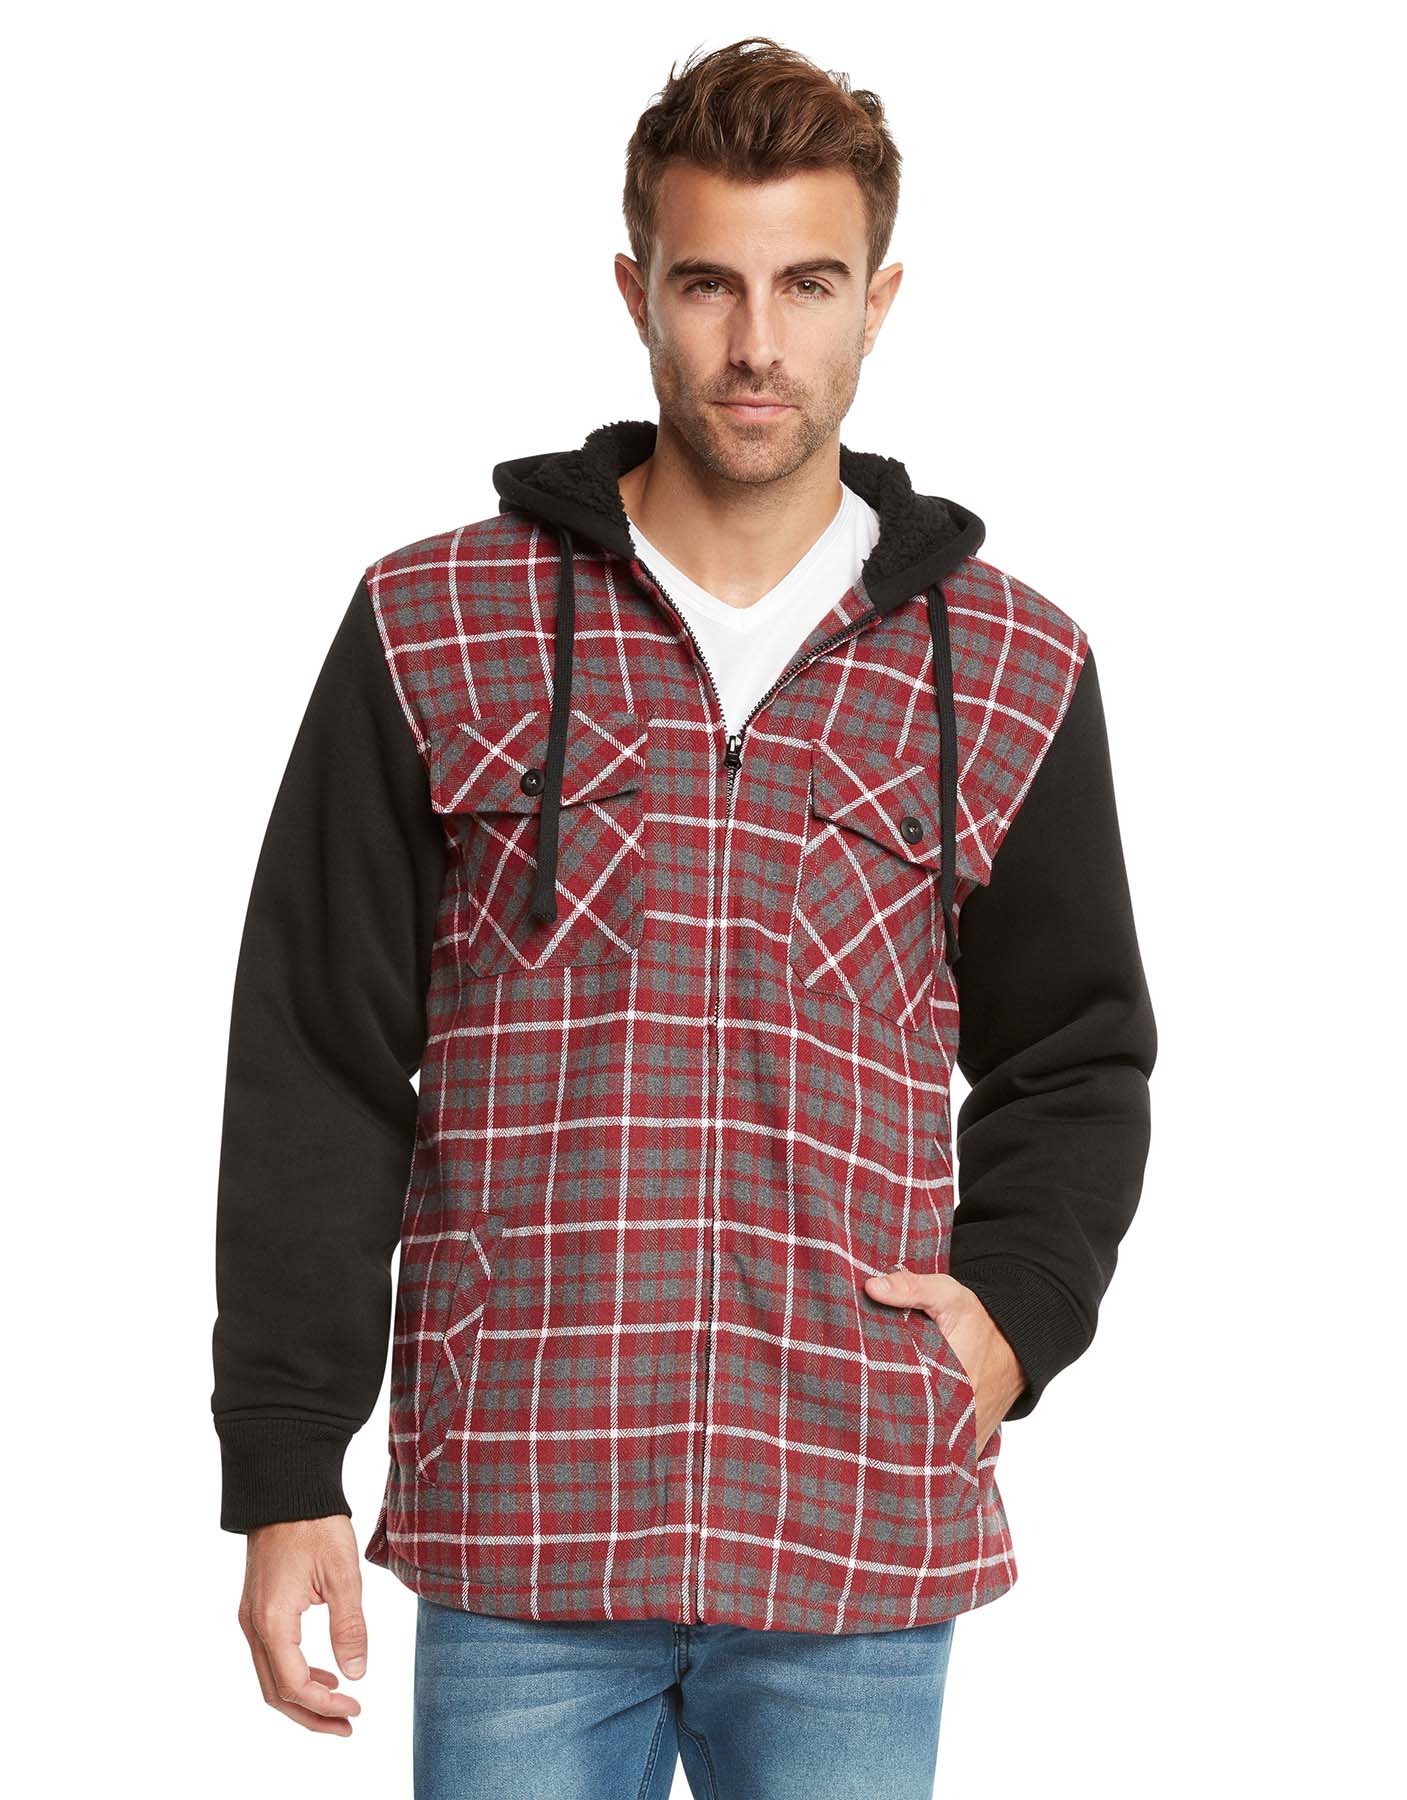 9 crowns essentials sherpa lined plaid flannel hoodie jacket ebay - Hooi plaid ...